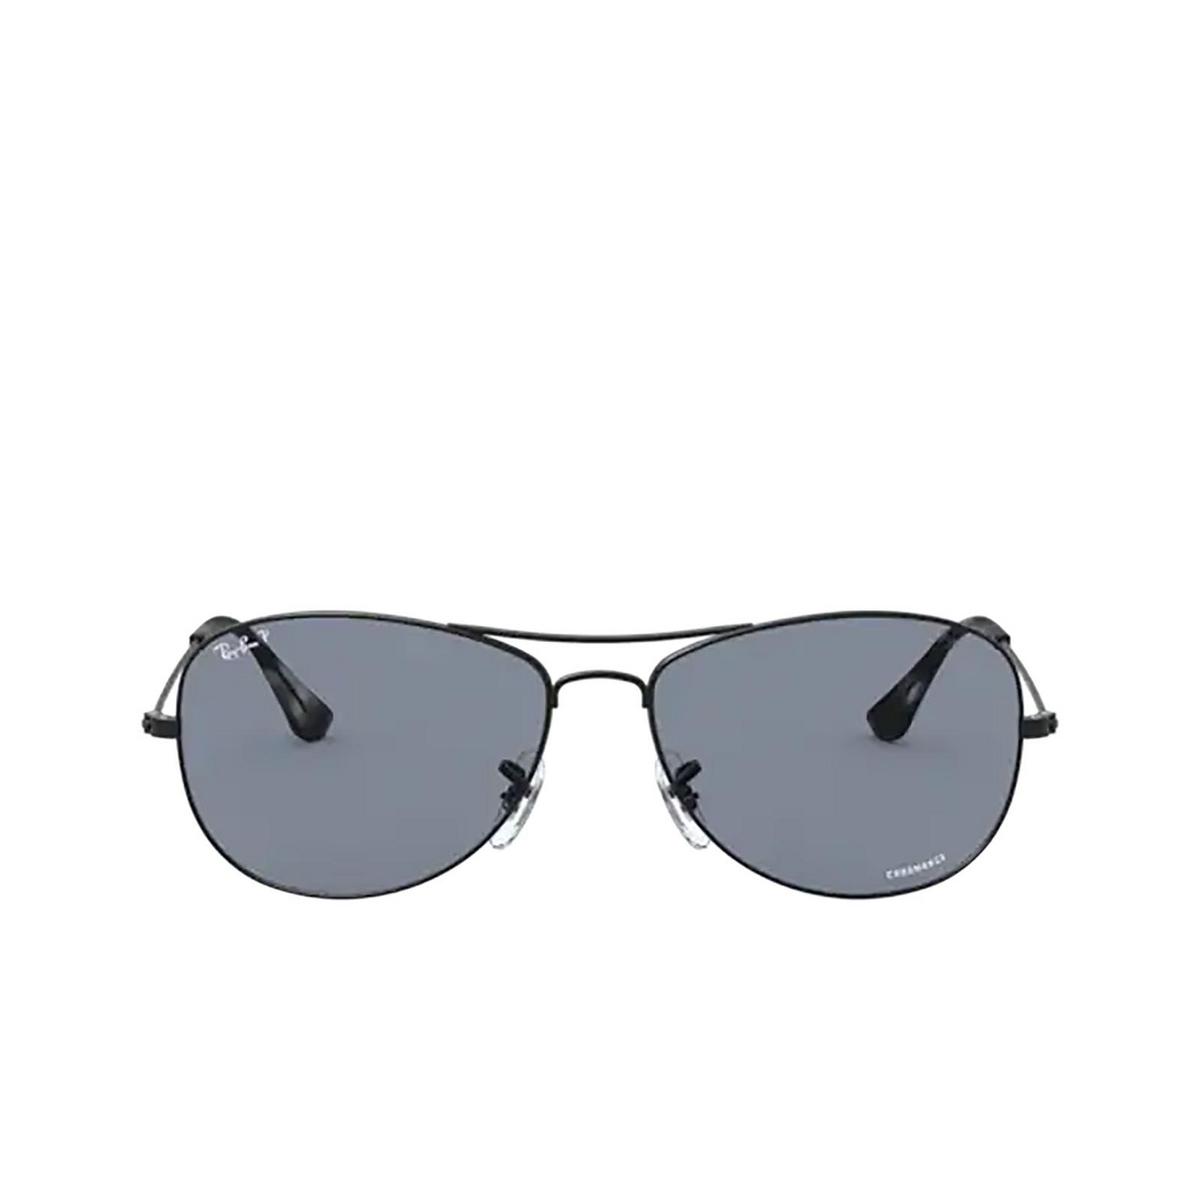 Ray-Ban® Aviator Sunglasses: RB3562 color Matte Black 006/BA - 1/3.